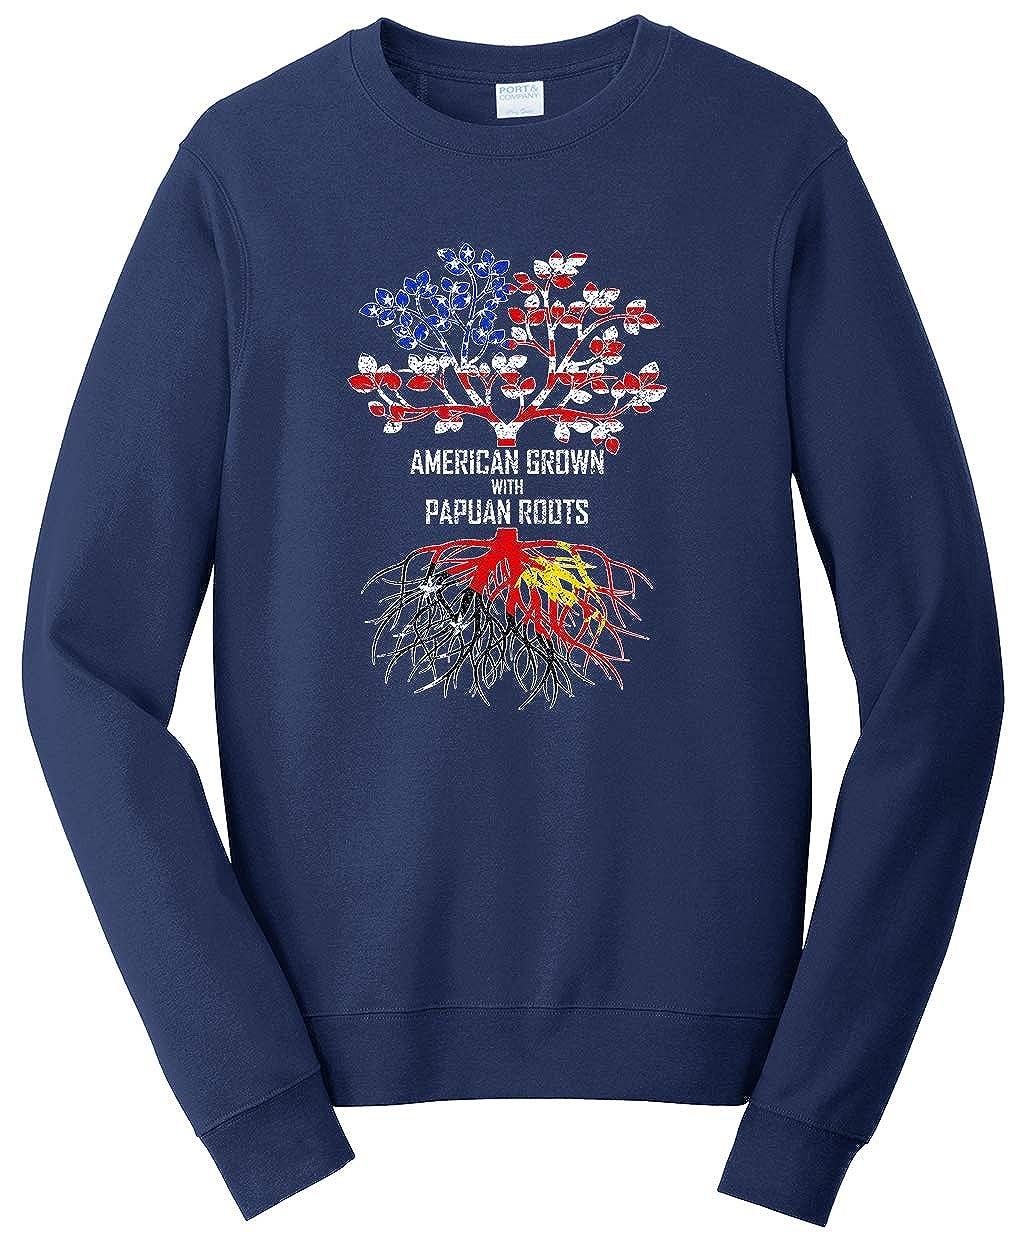 Tenacitee Unisex American Grown with Papuan Roots Sweatshirt